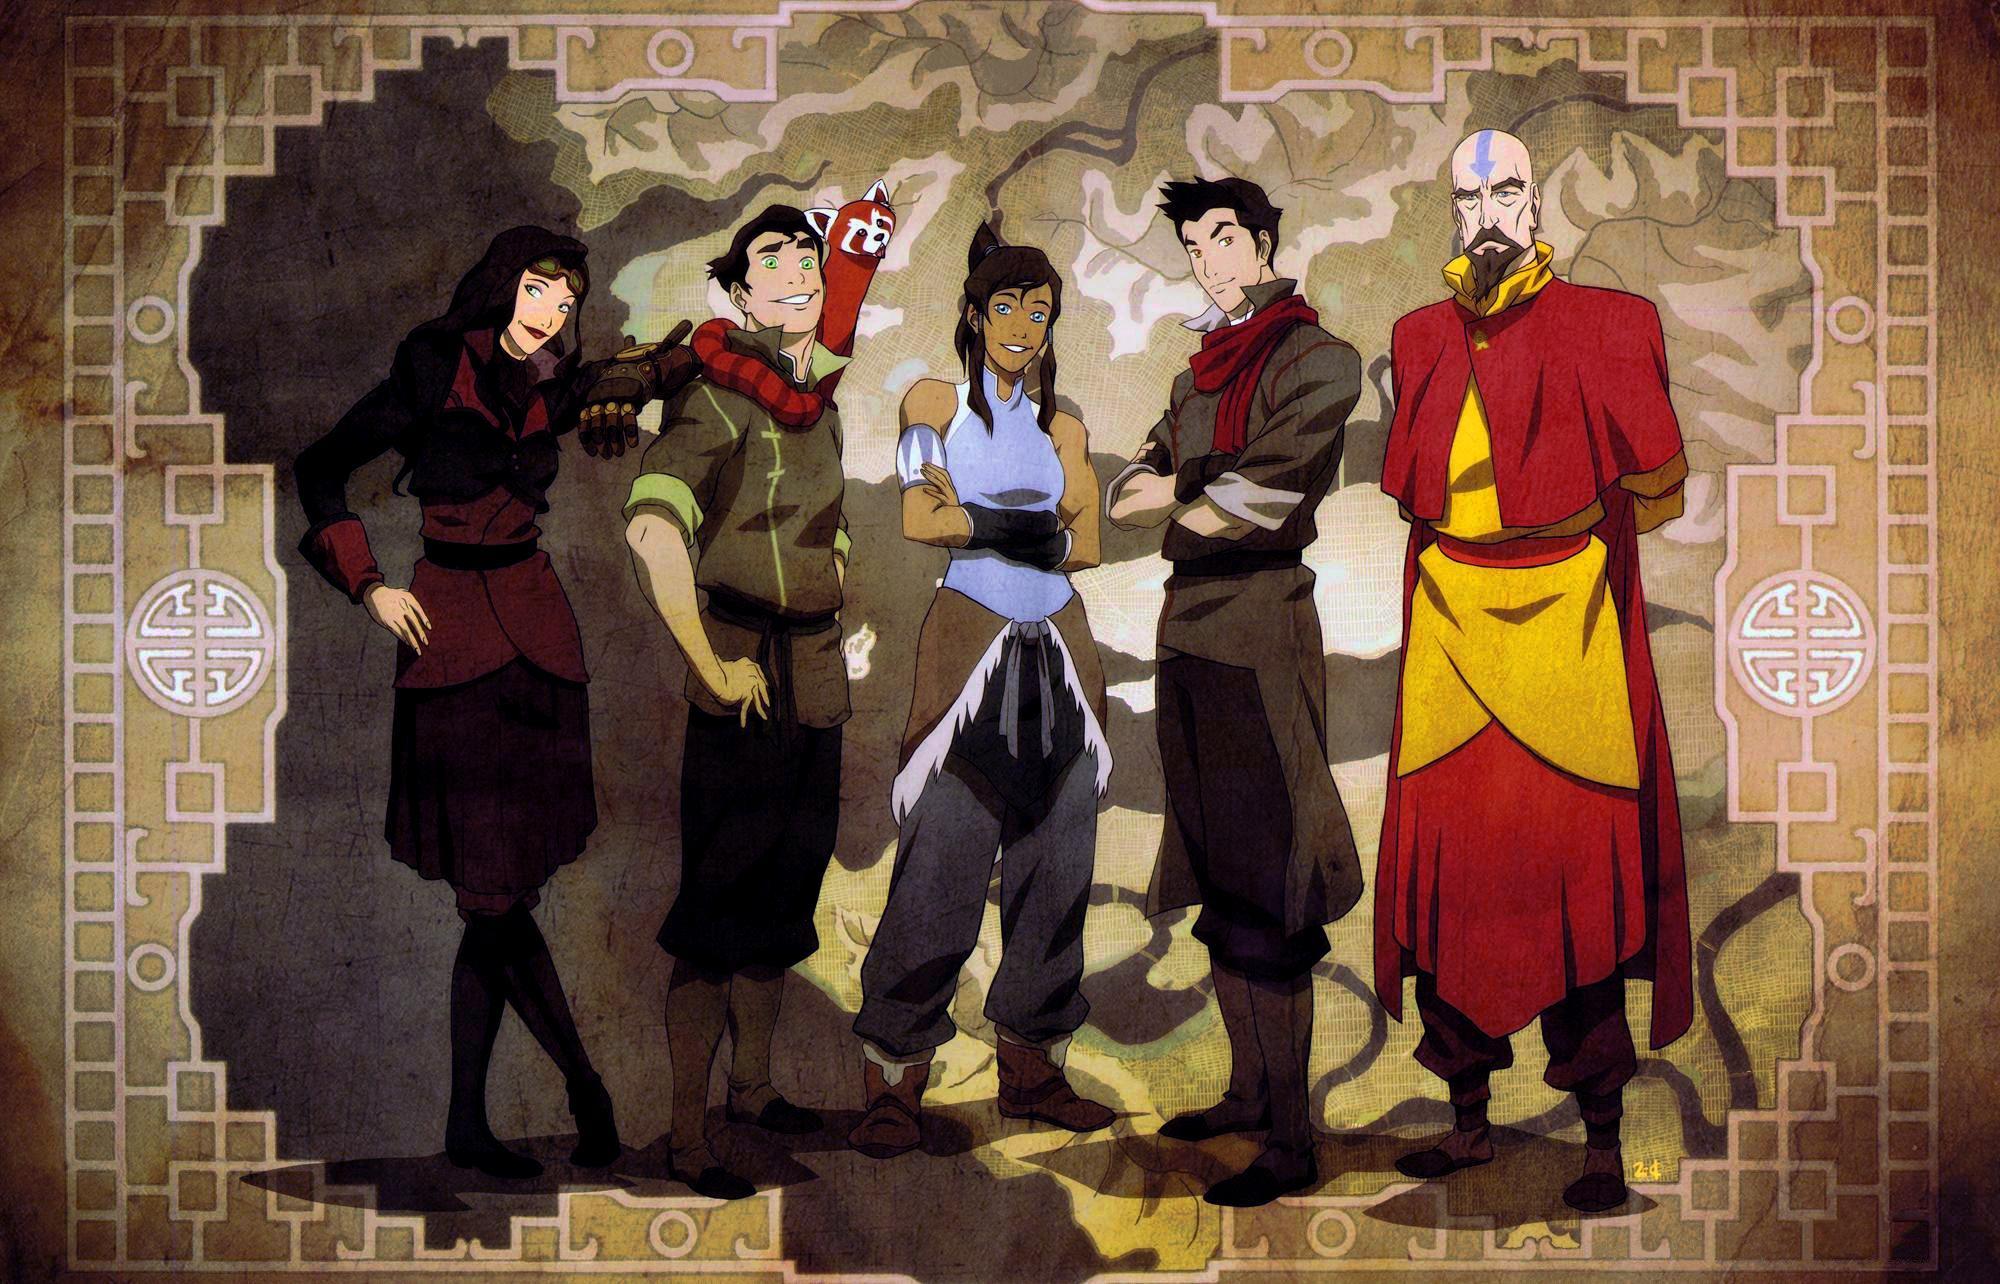 Avatar the last Airbender wallpaper (24)